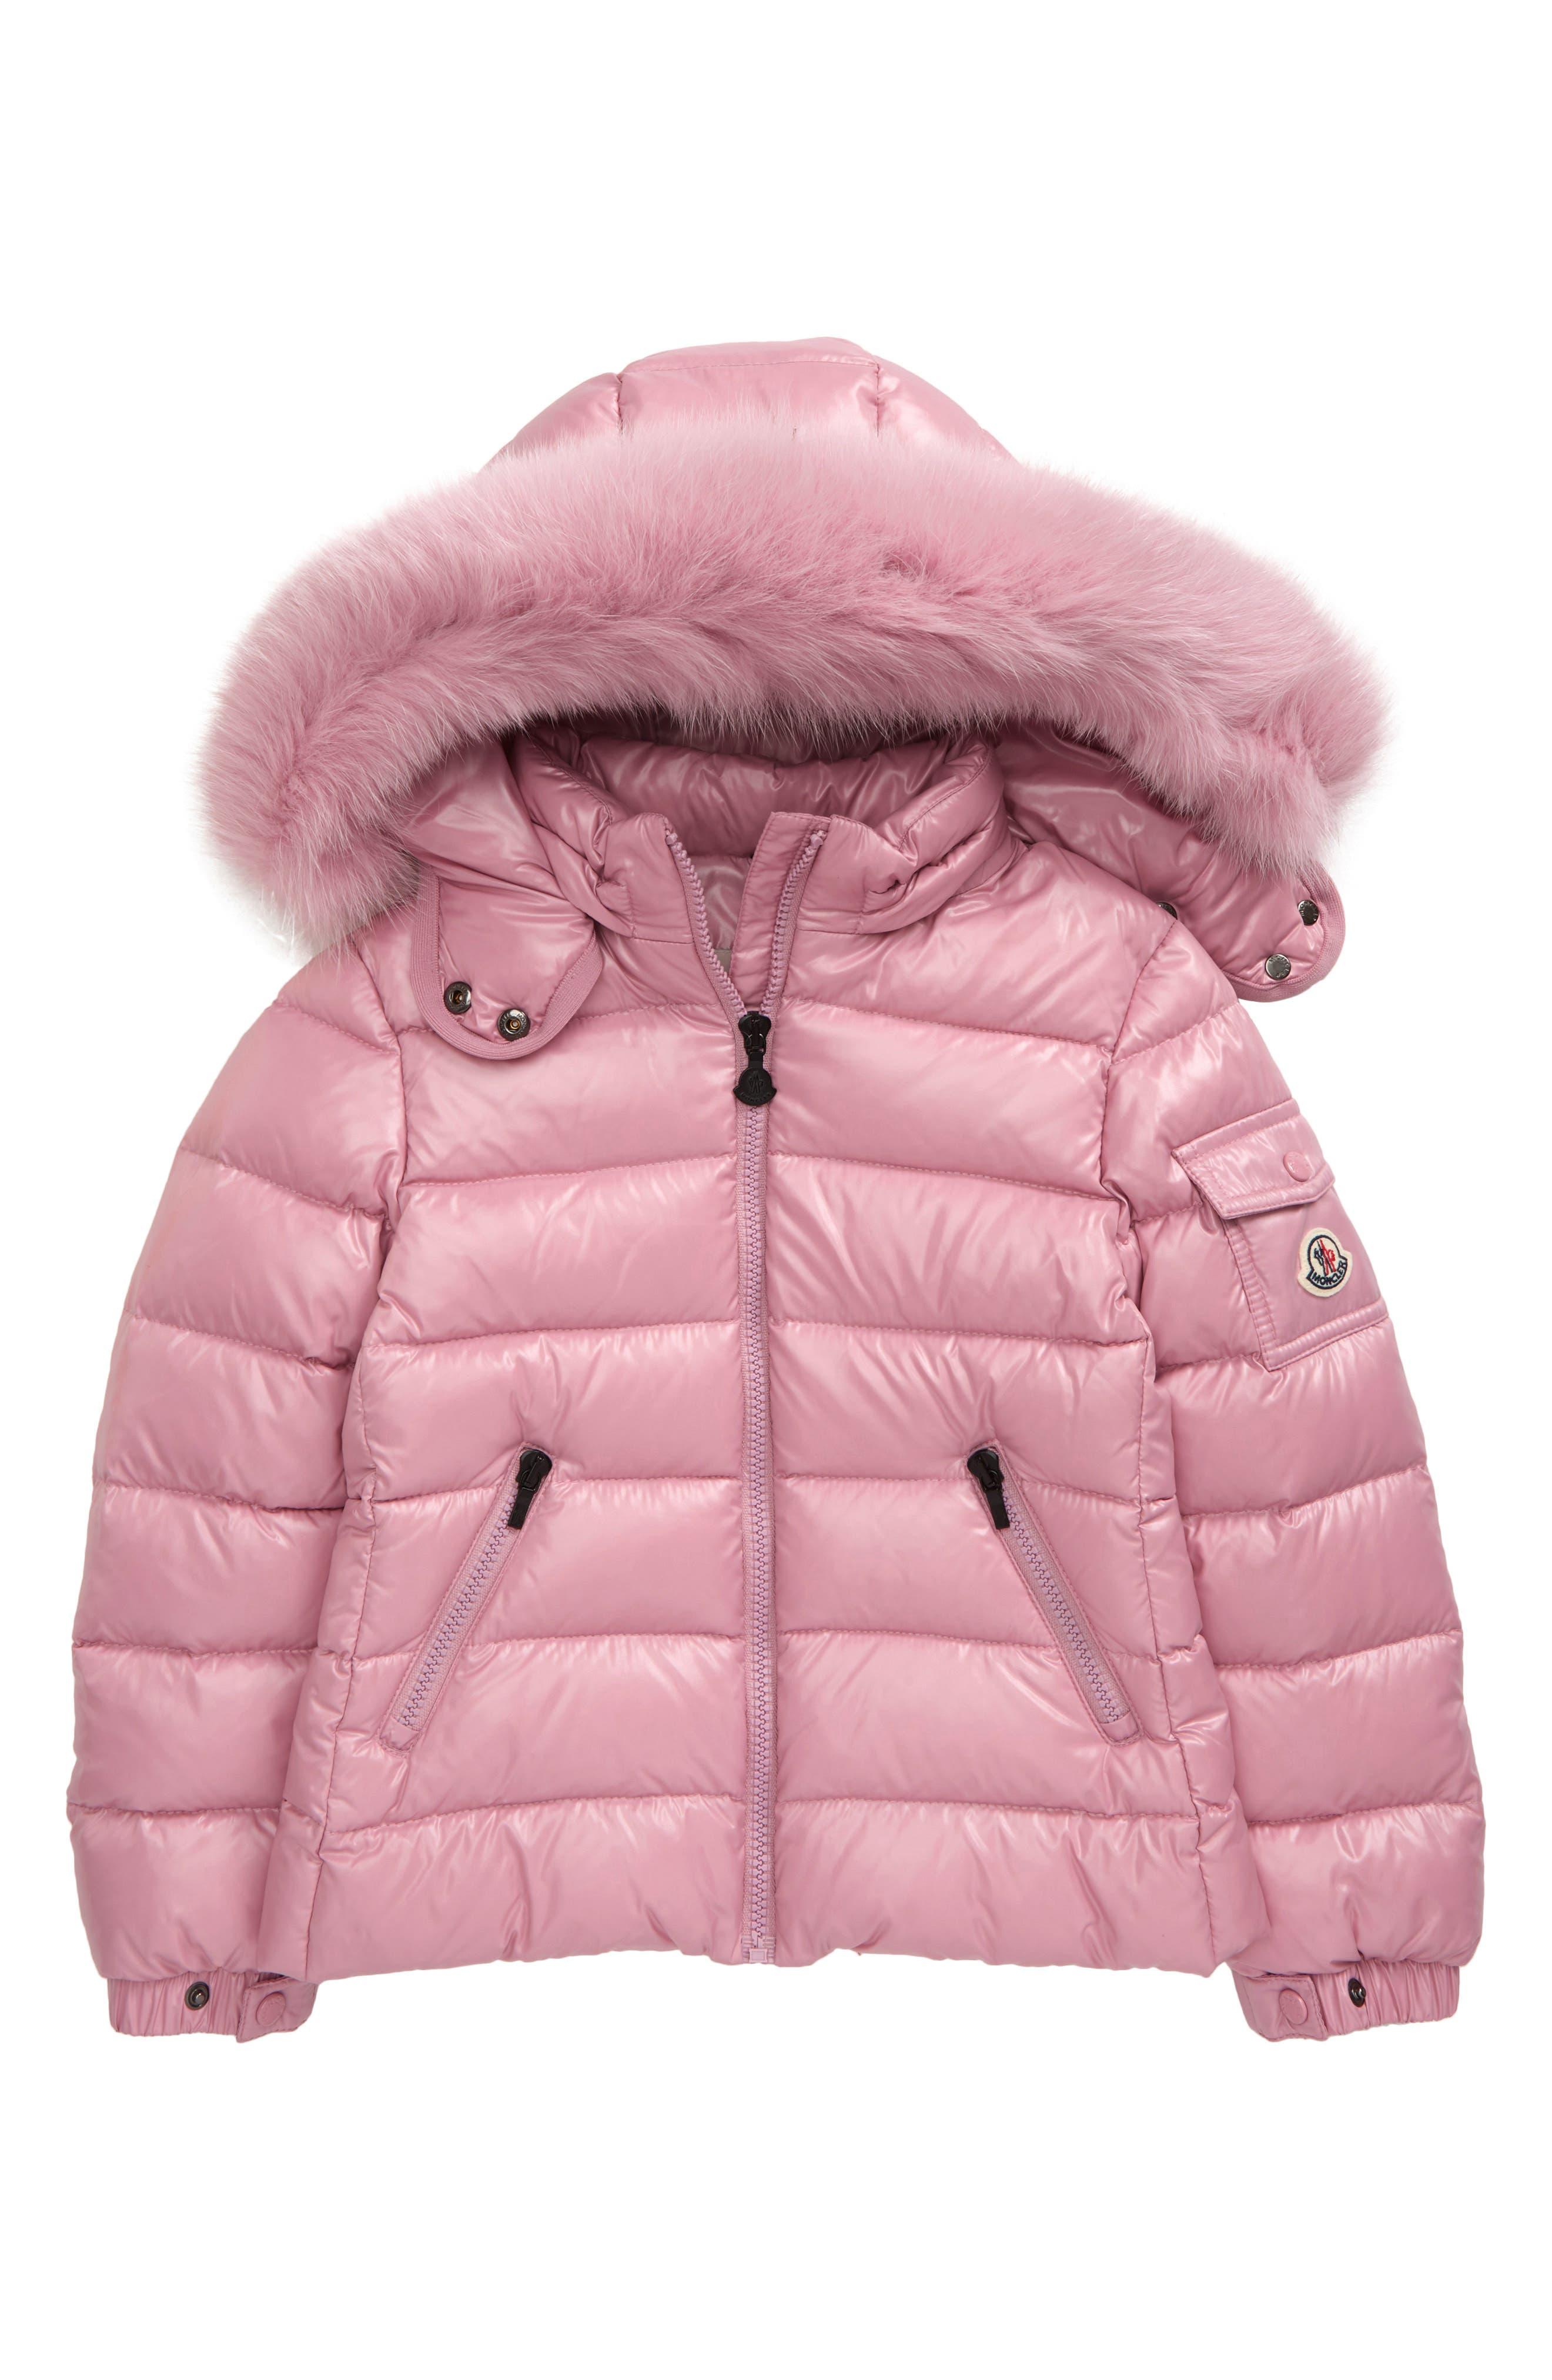 FTCayanz Girls Winter Parka Coat Winter Down Jackets Kids Faux Fur Hooded Long Coats